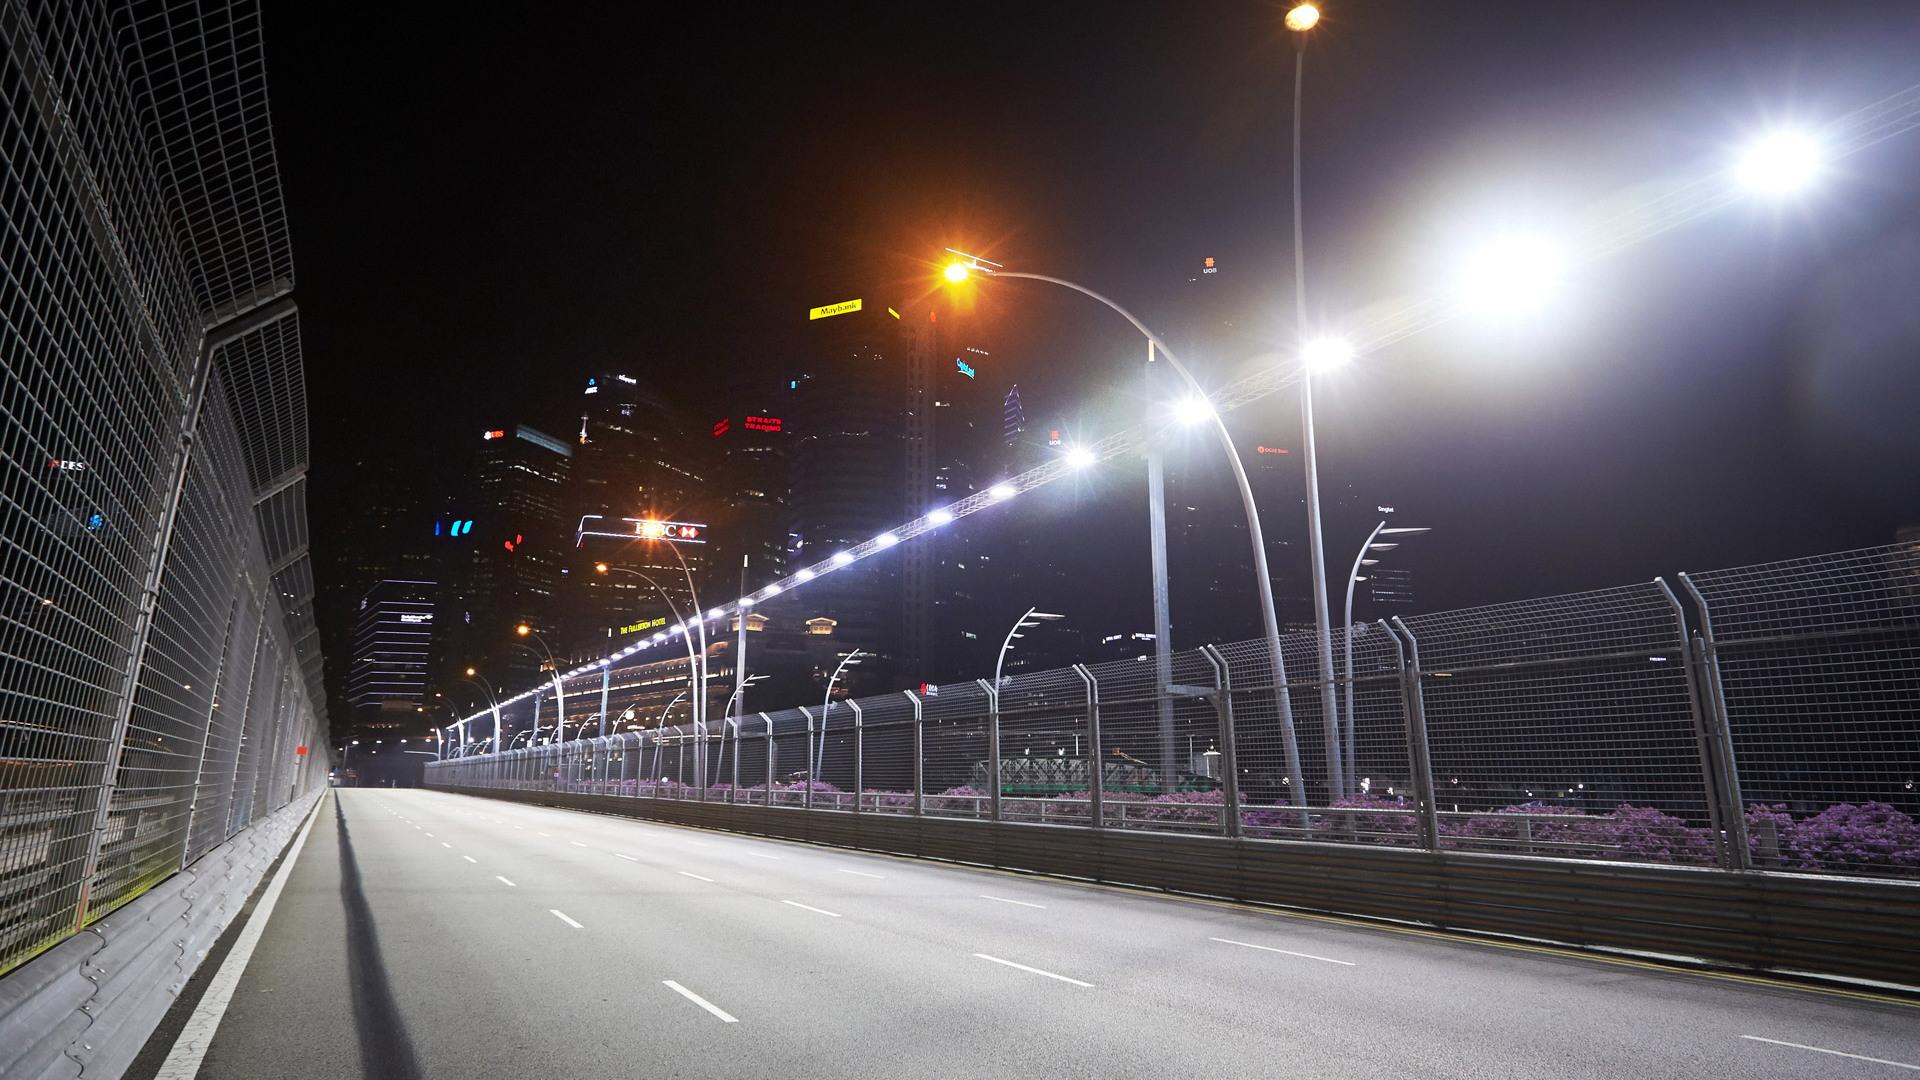 Marina Bay Circuit, home of the Formula 1 Singapore Grand Prix